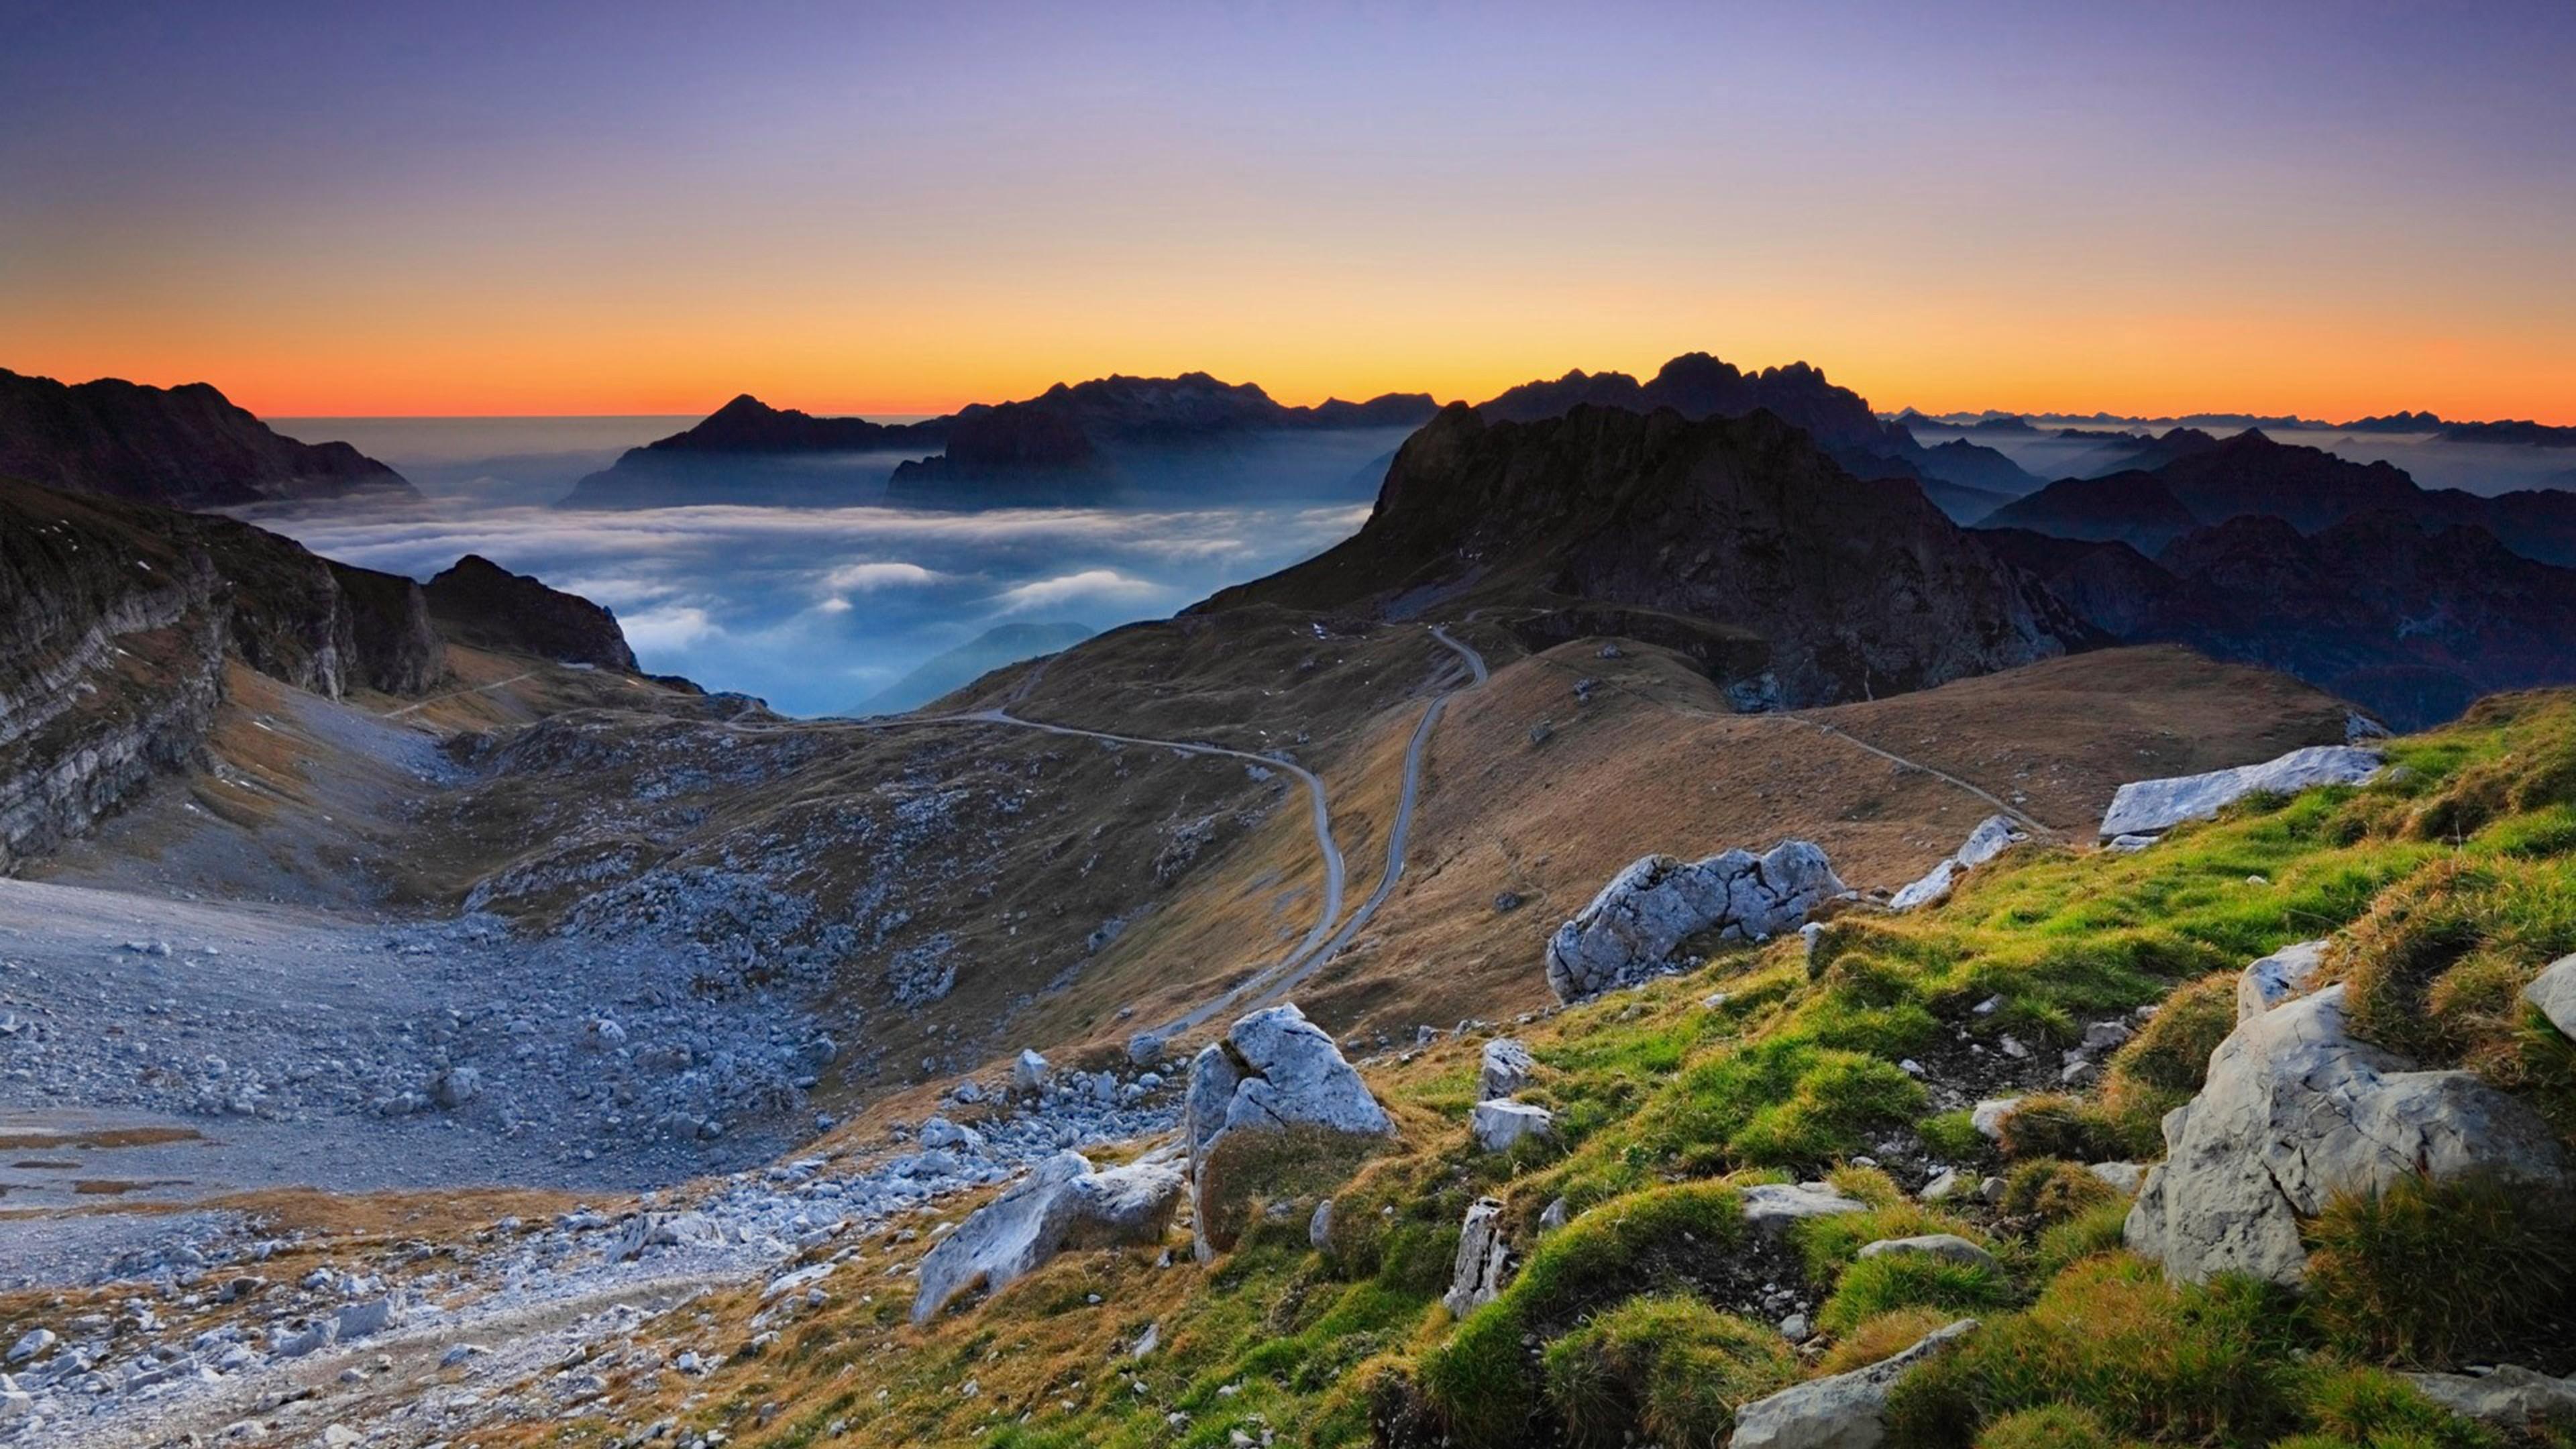 Wallpaper sky wilderness highland coast headland morning mount scenery fell dawn - Highland park wallpaper ...